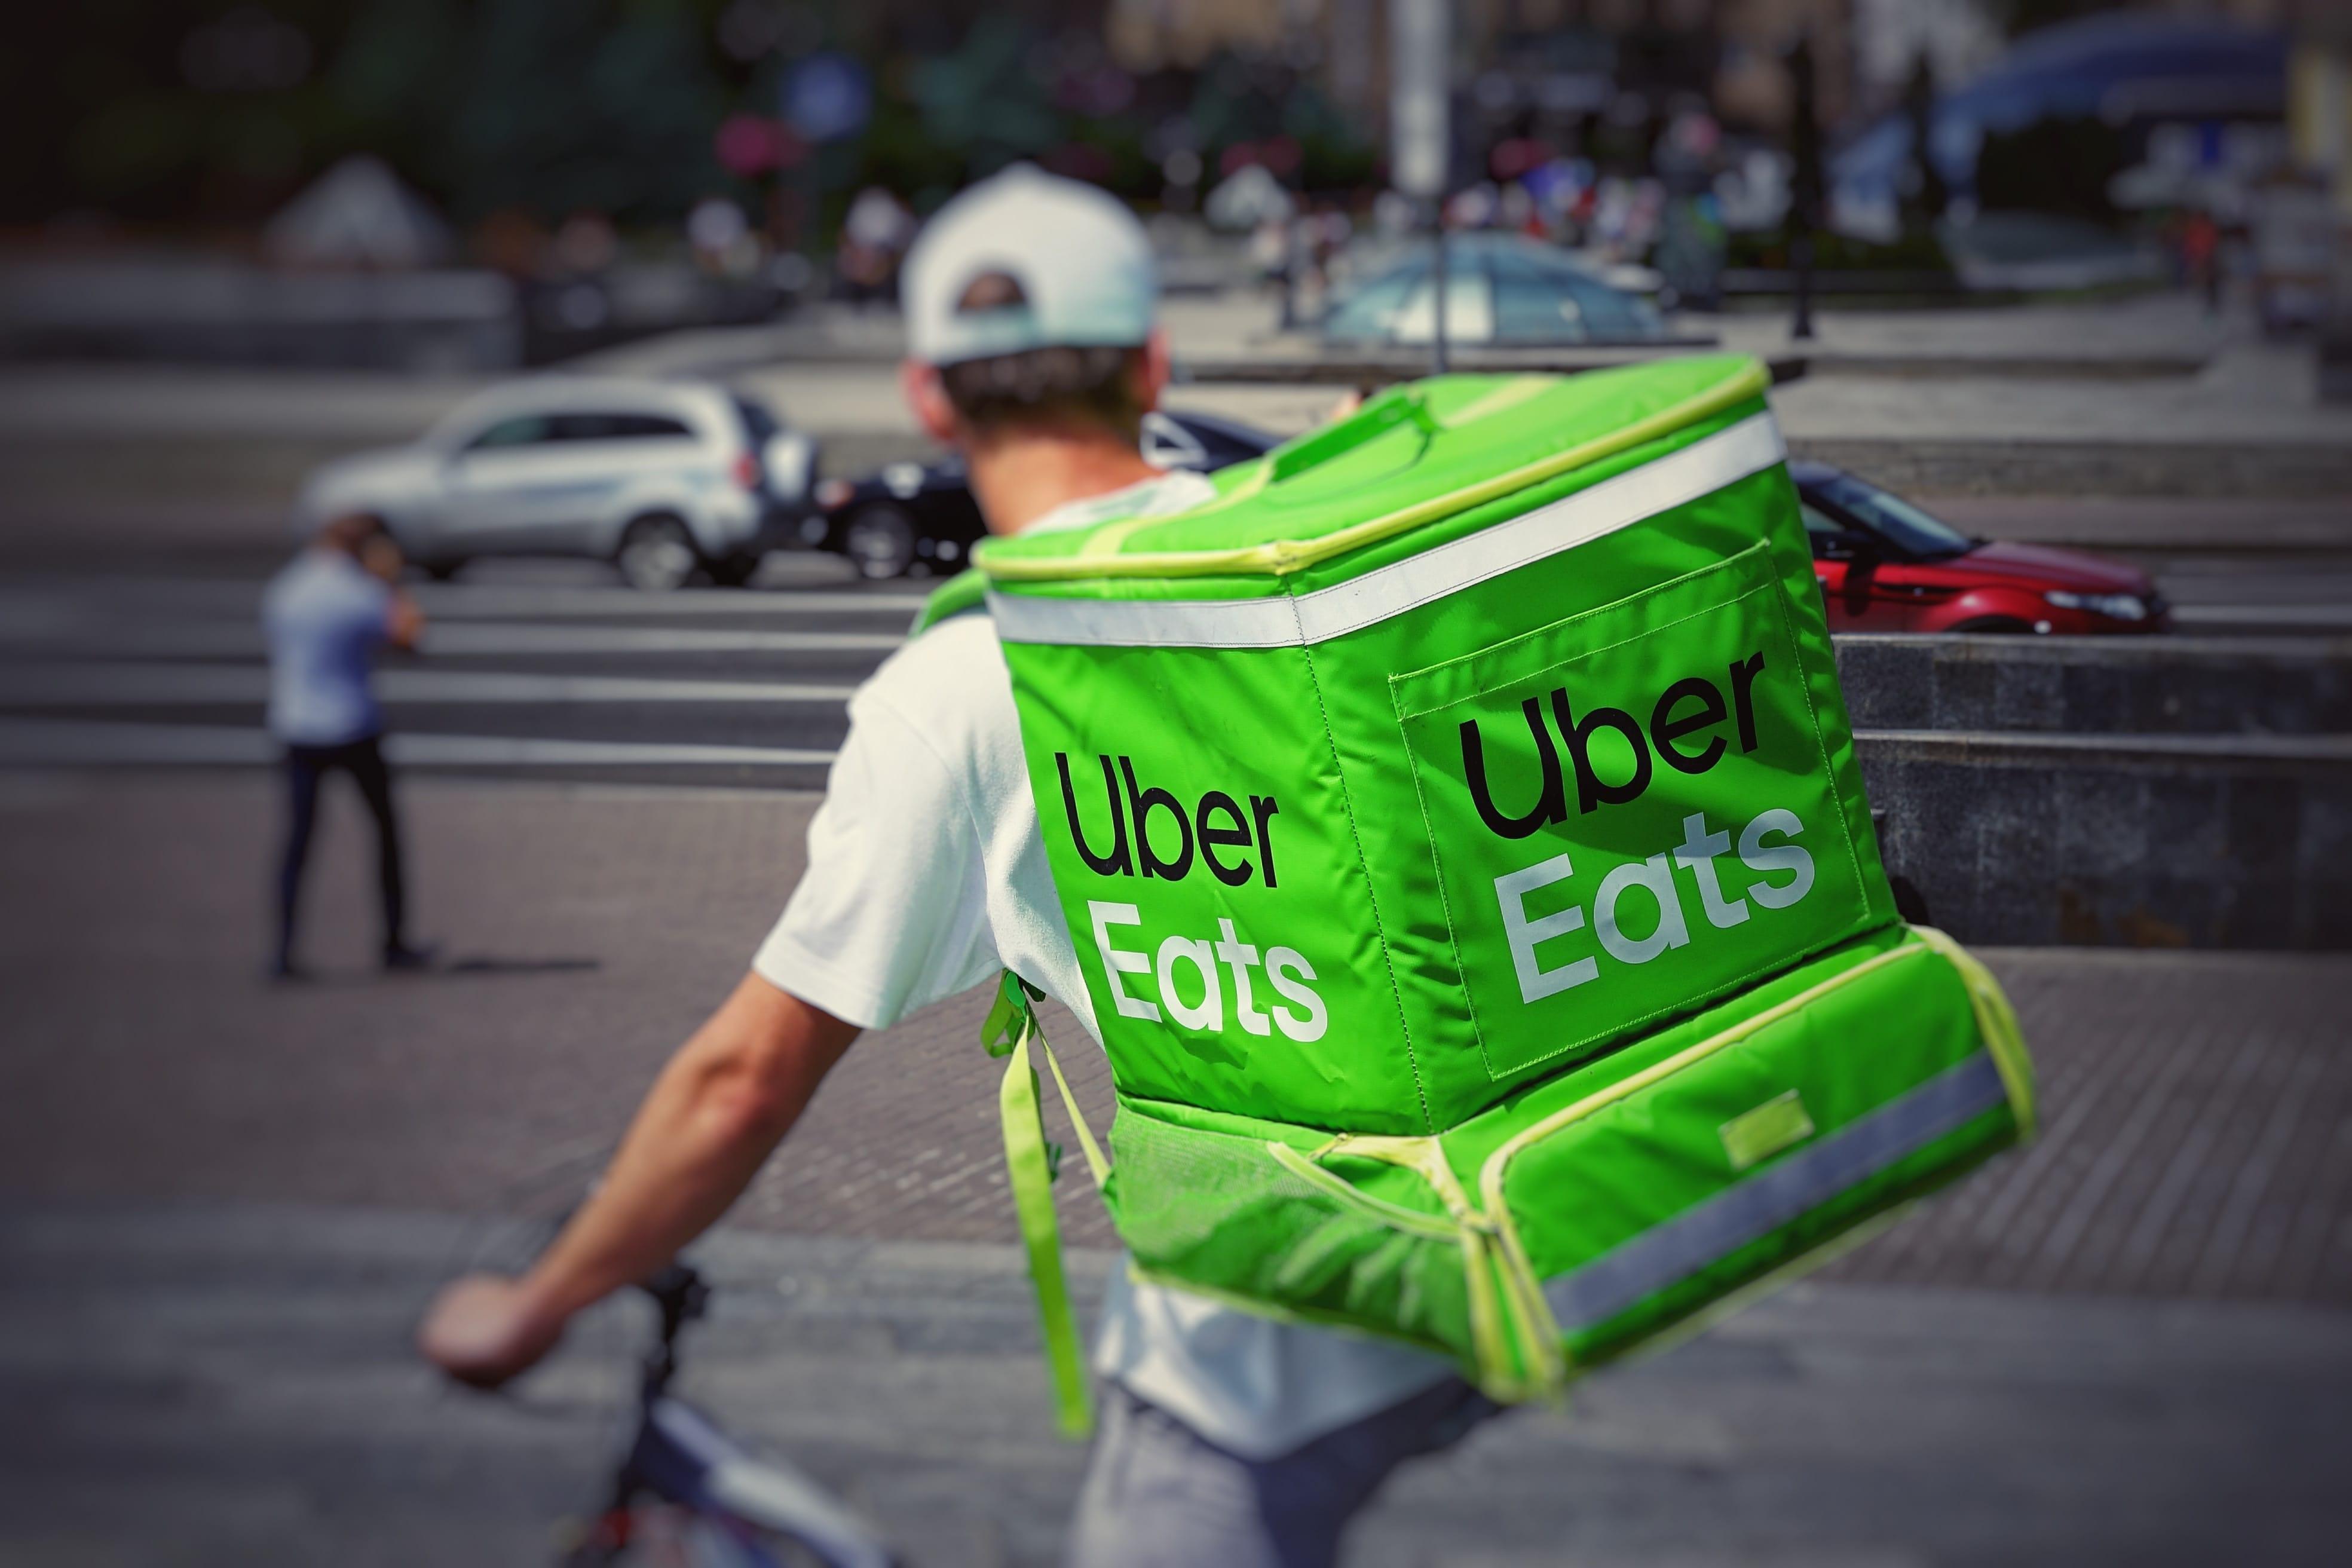 Livreur_uber_eats